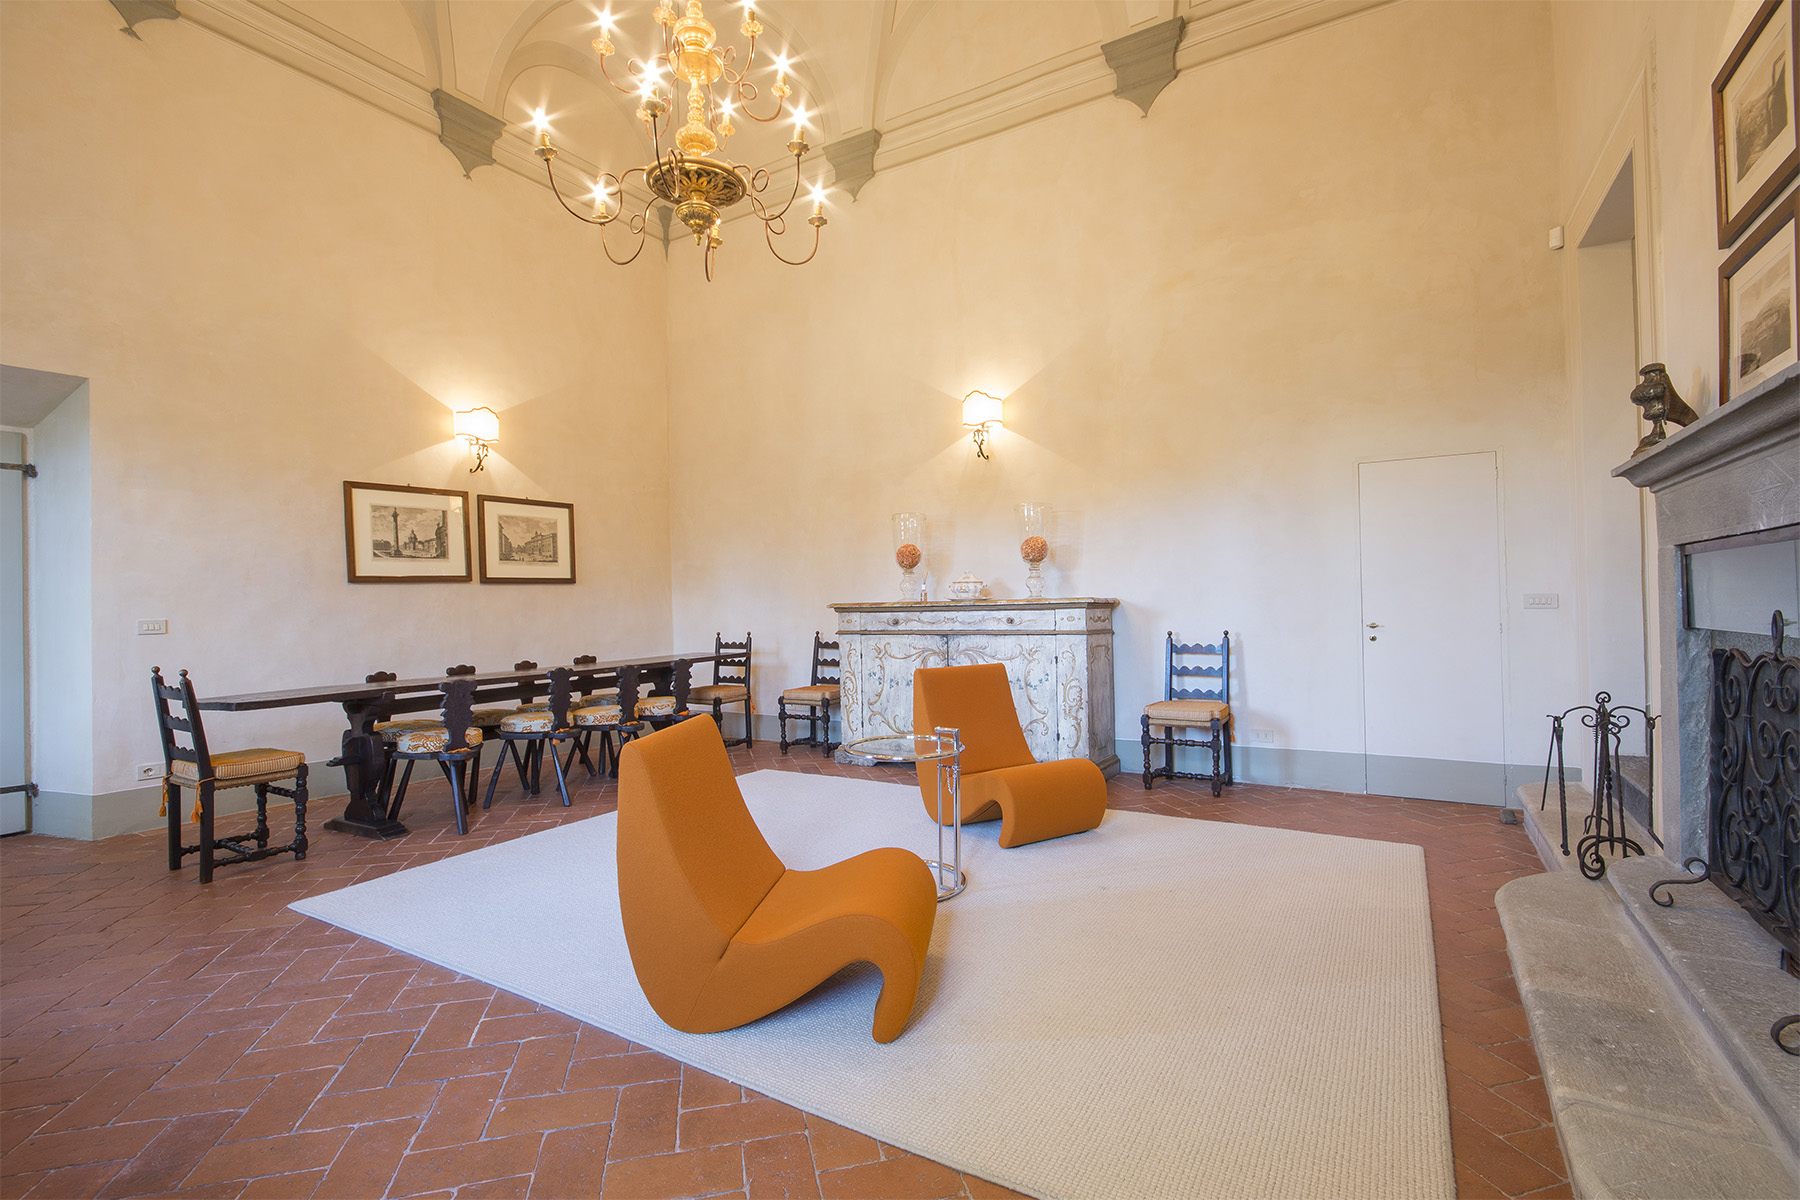 Villa in Affitto a Impruneta: 5 locali, 560 mq - Foto 5